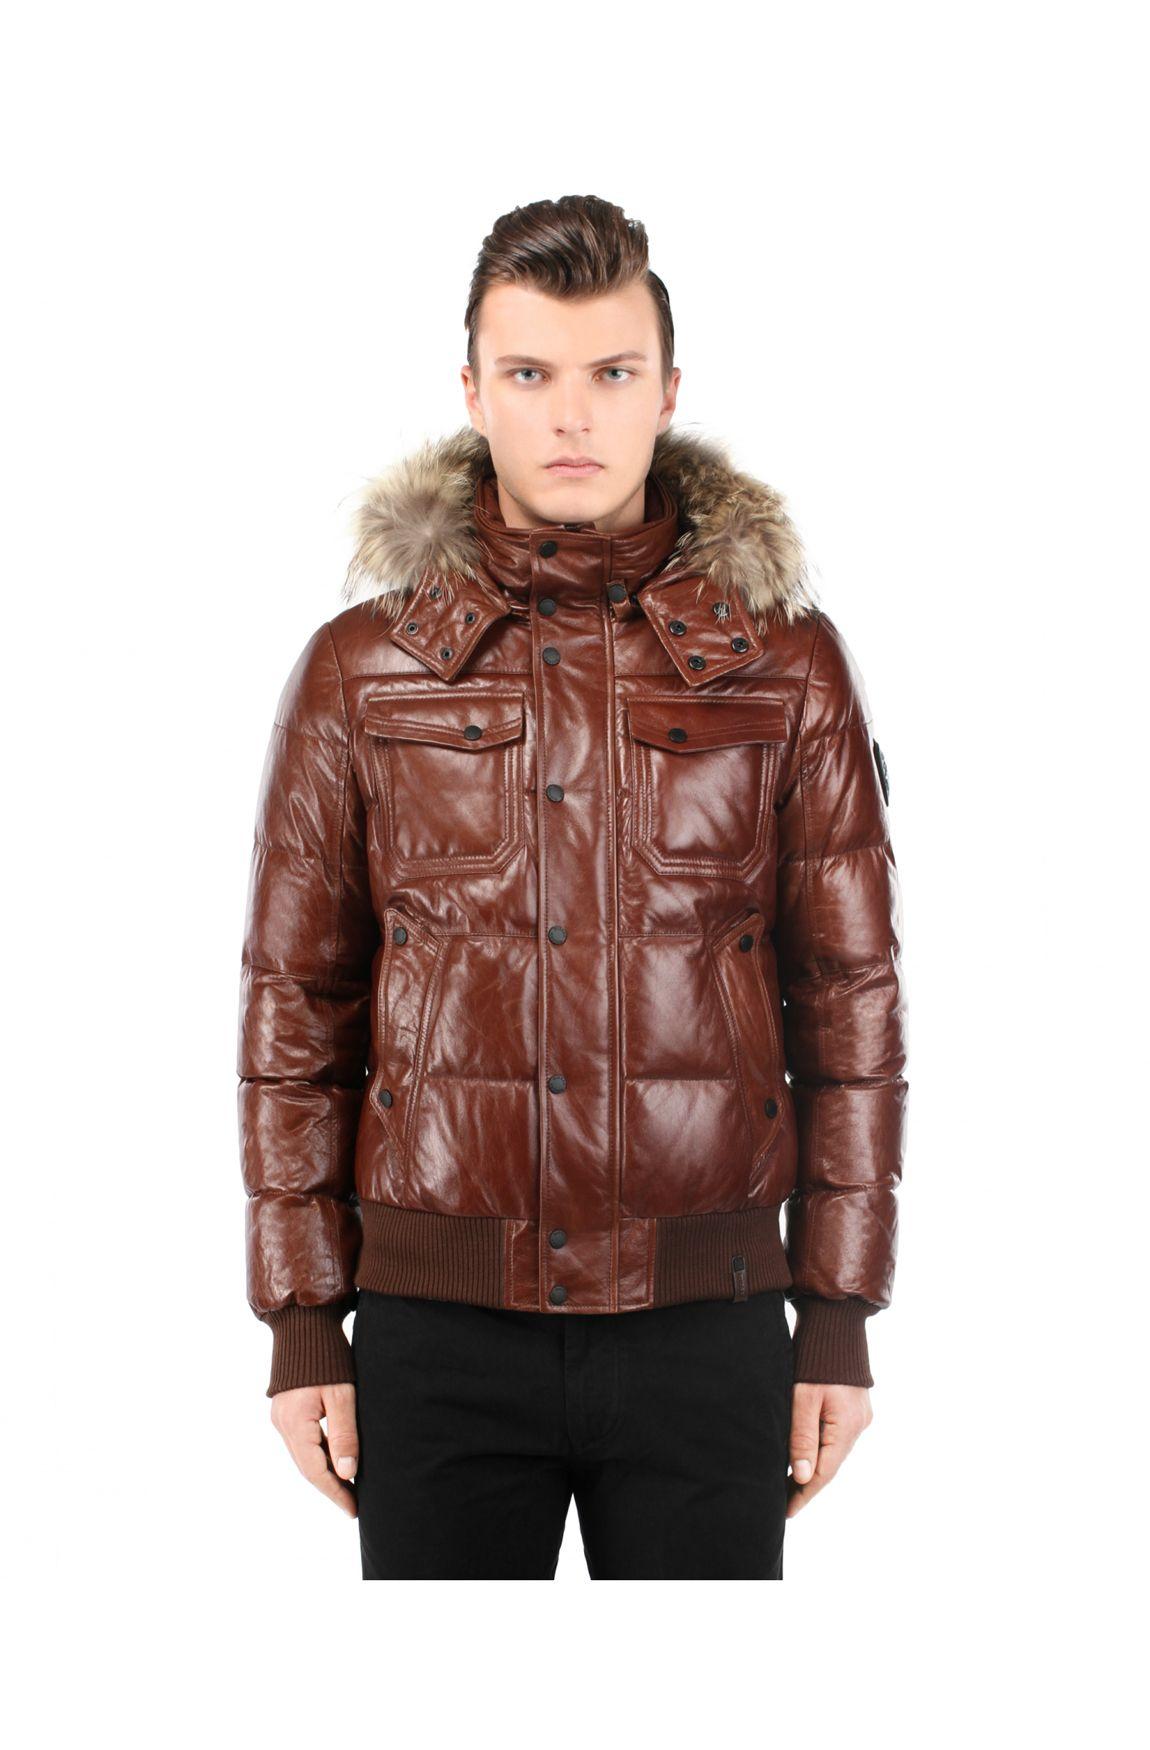 3c9ddbc985 Rudsak Winter Jacket- Viper 6114959 in cohiba (S,M,L) | espace miX ...